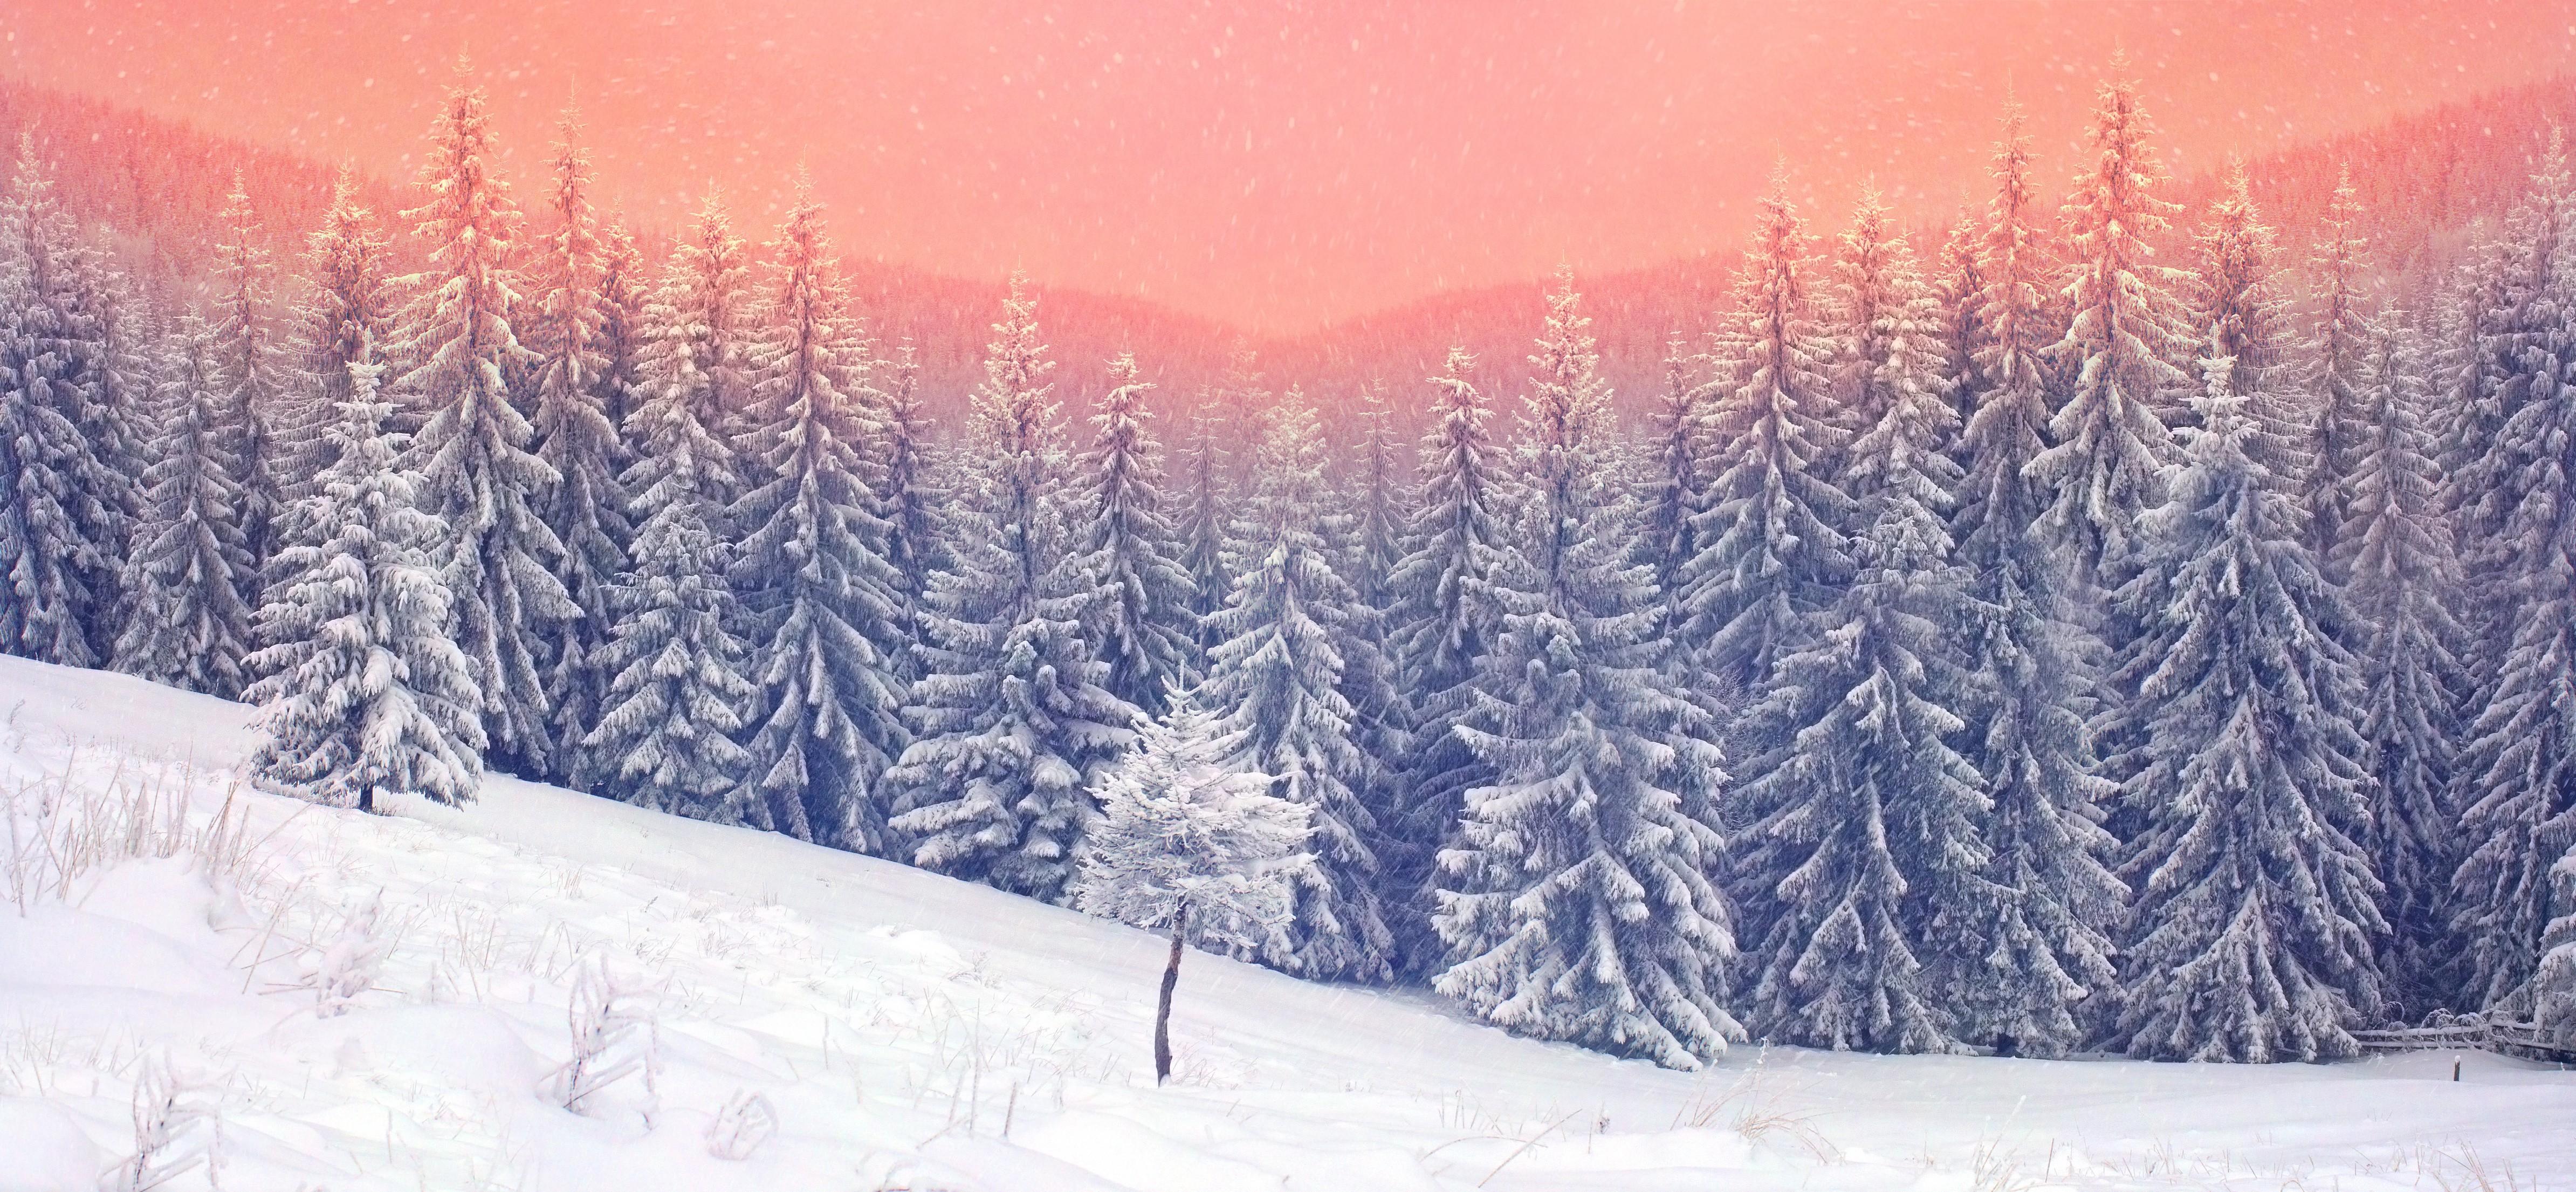 landscape snow trees 1574939525 - Landscape Snow Trees -